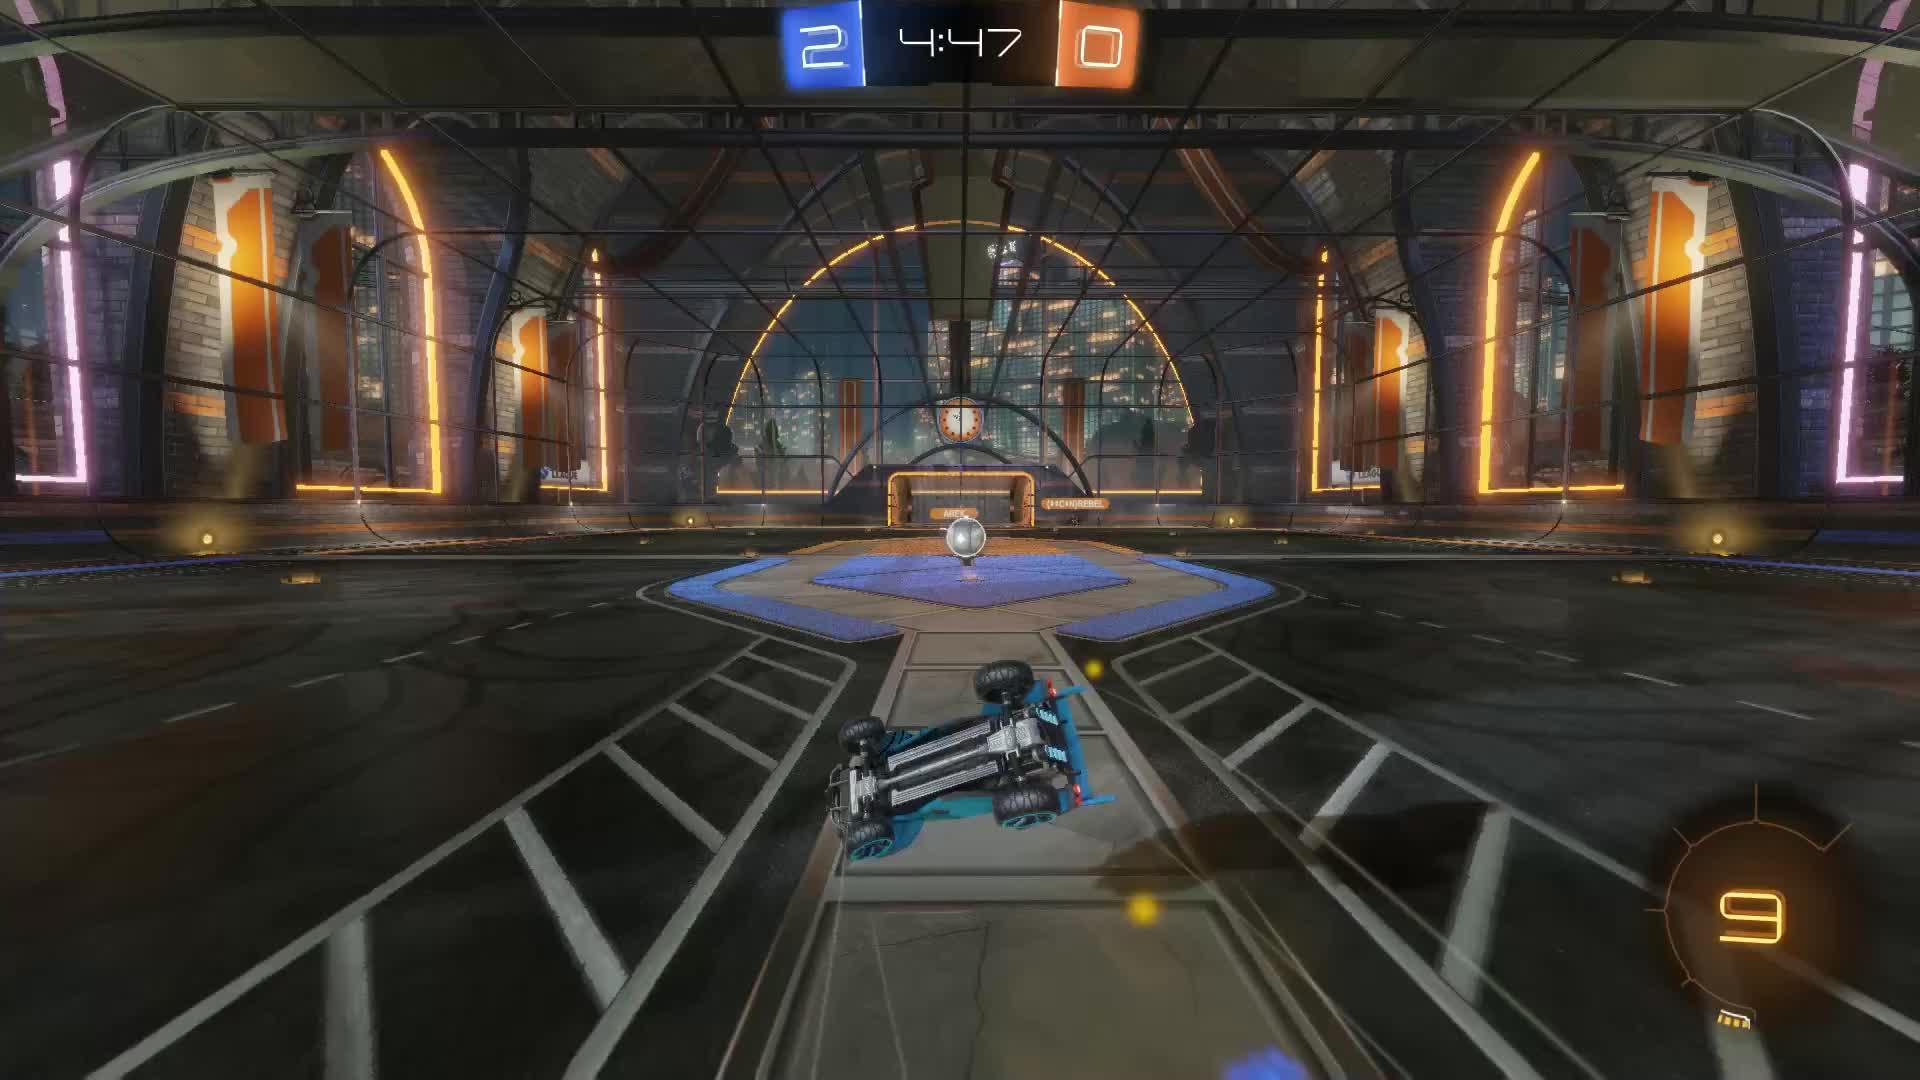 Gif Your Game, GifYourGame, Goal, Rocket League, RocketLeague, mfw, Goal 3: mfw GIFs